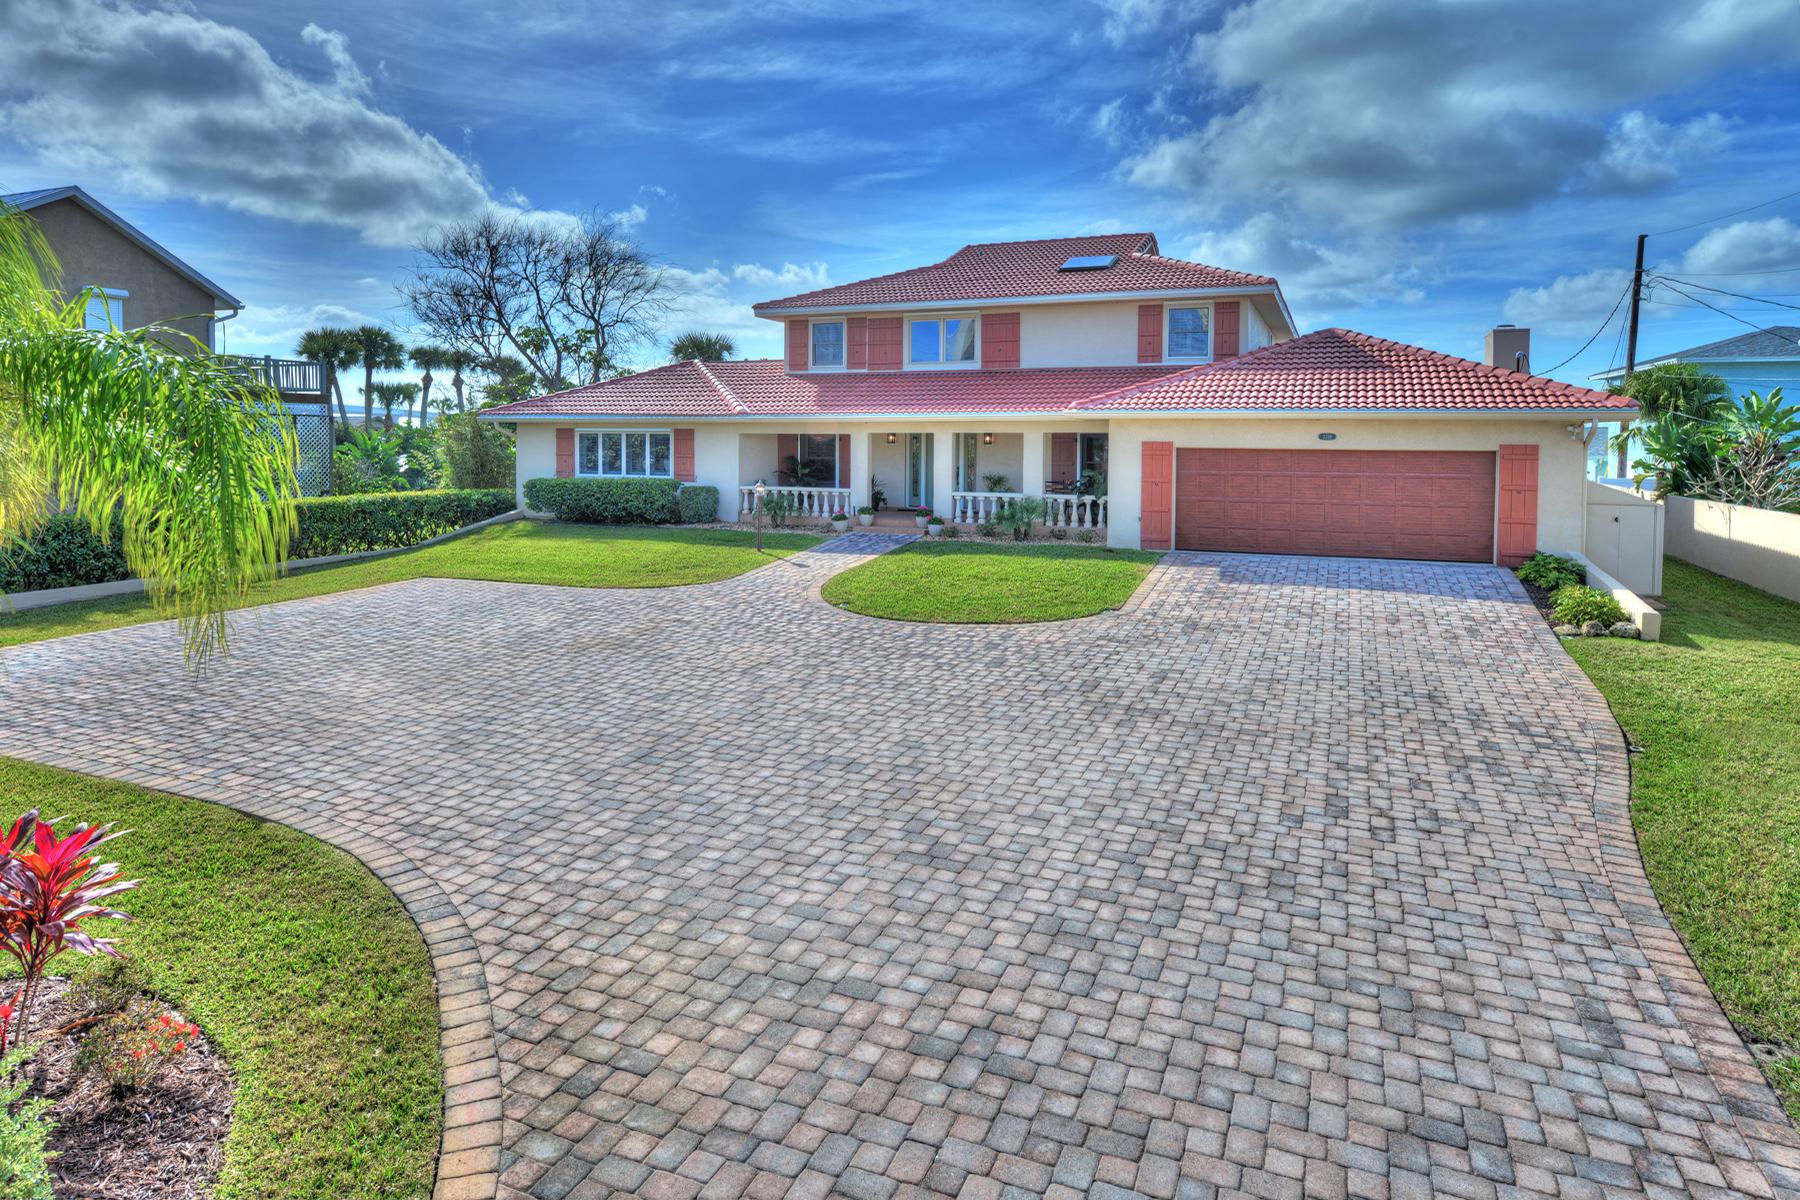 Single Family Homes for Active at 3318 PENINSULA 3318 S Peninsula Dr Port Orange, Florida 32127 United States